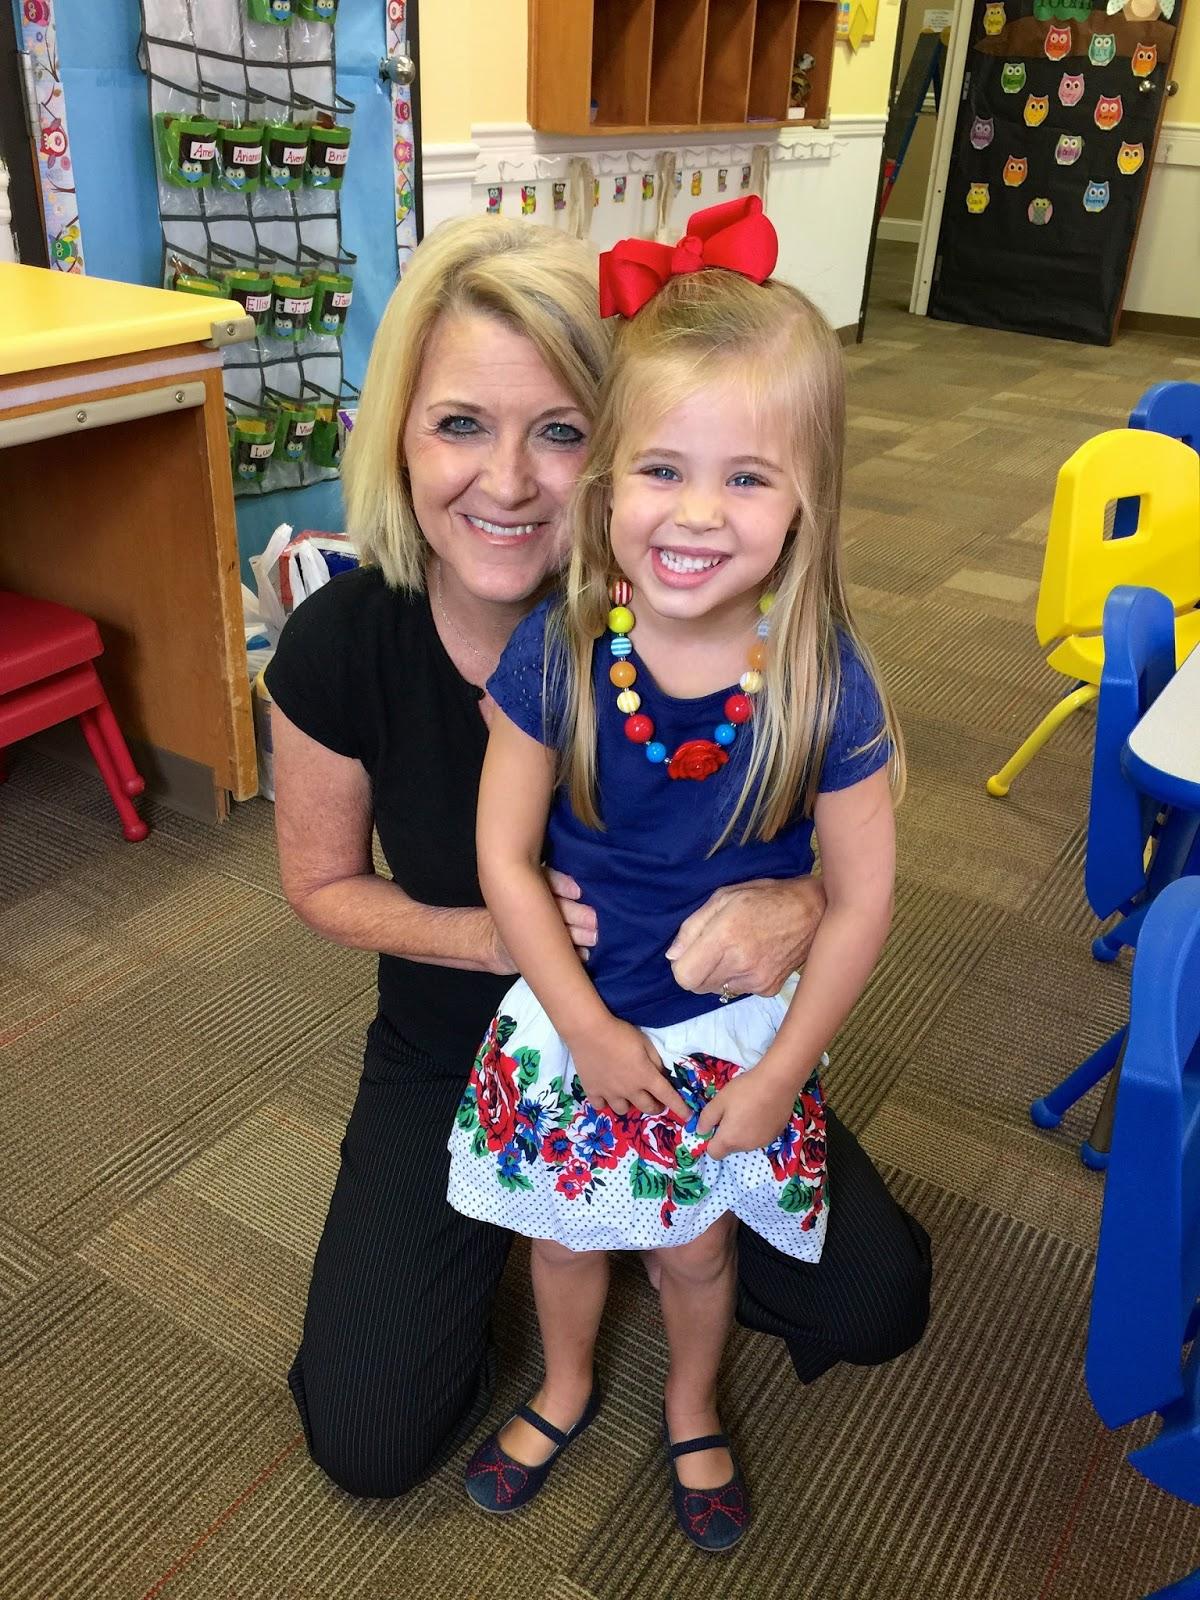 Britt's 1st Day of 3 Year Old Preschool